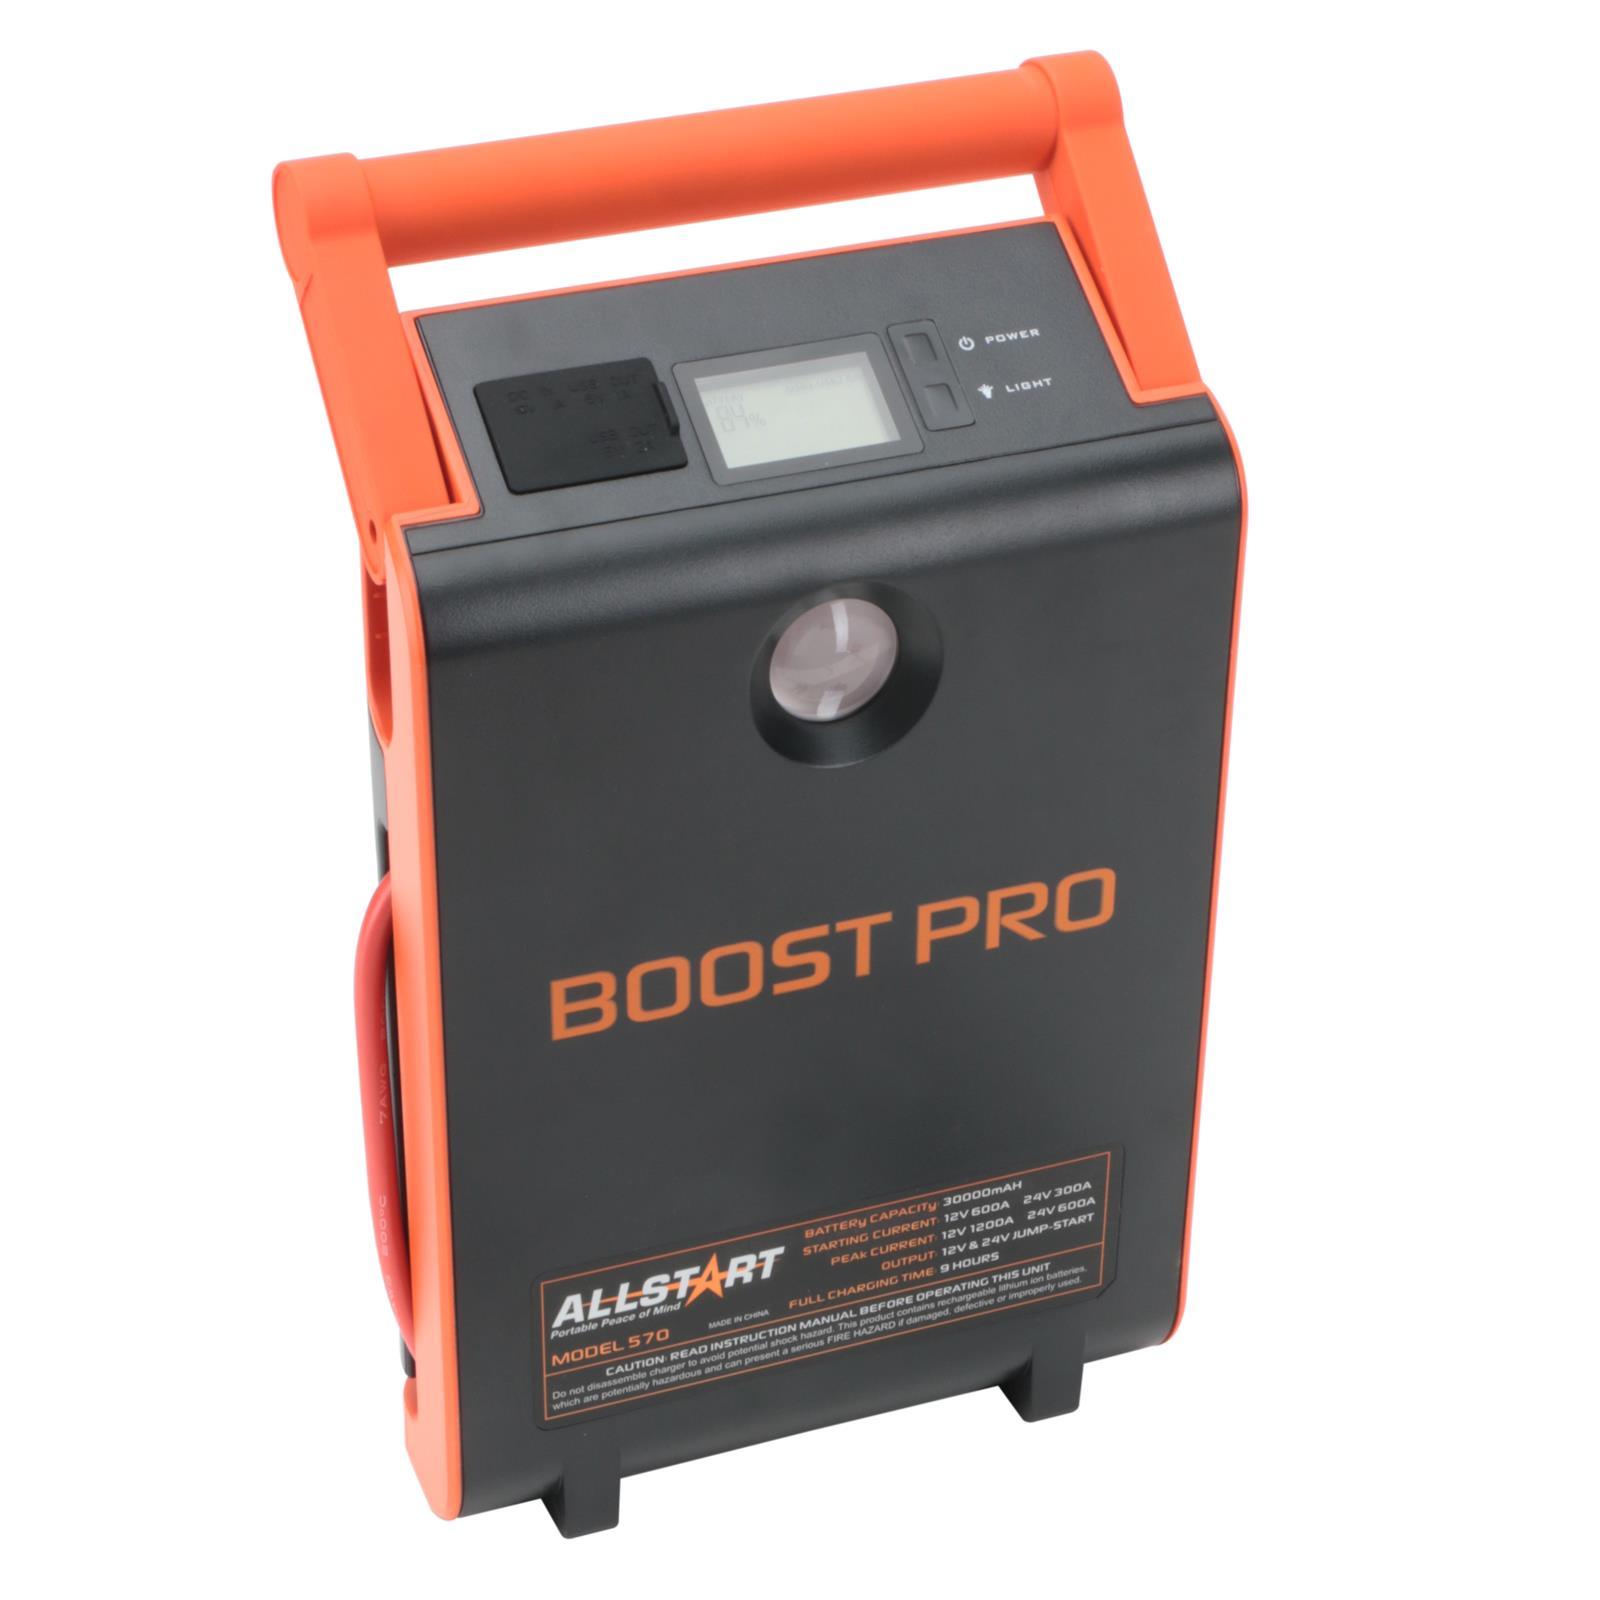 Allstart 570 Horizon Boost Pro Battery Charger 12v 24v Auto Meter Wire Harness